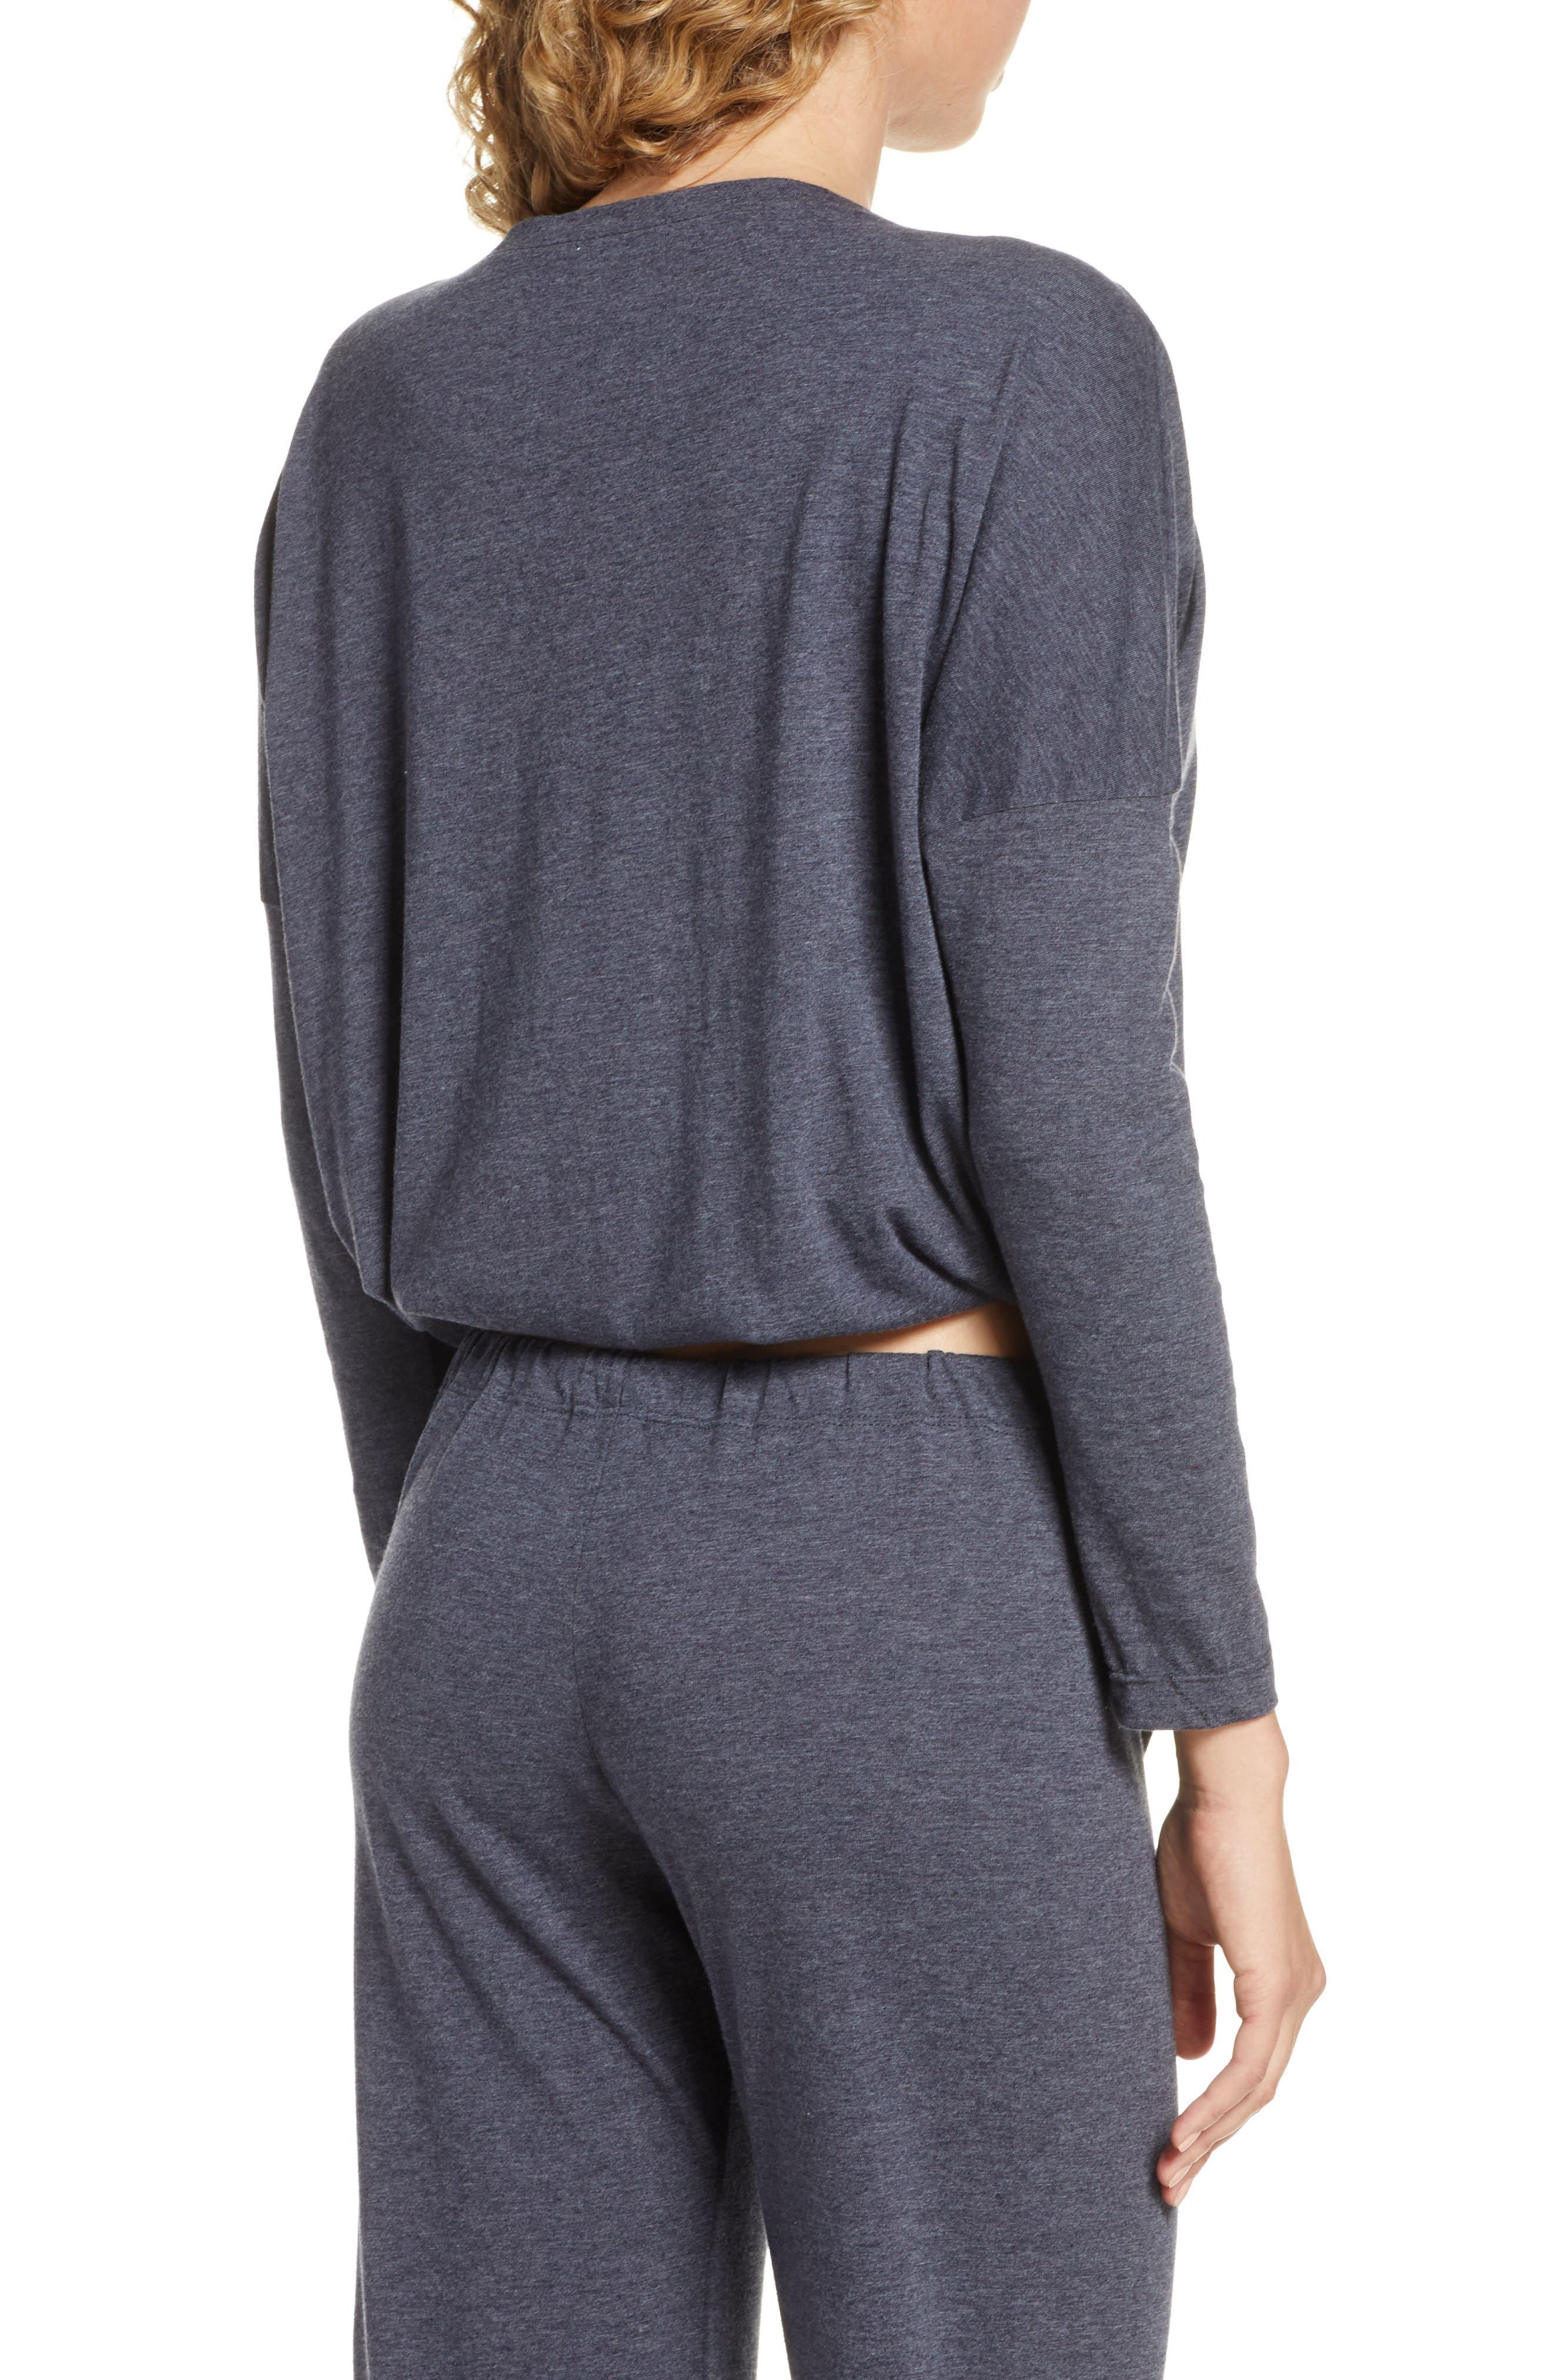 ac1c31c22b6 Women's Loungewear | Nordstrom